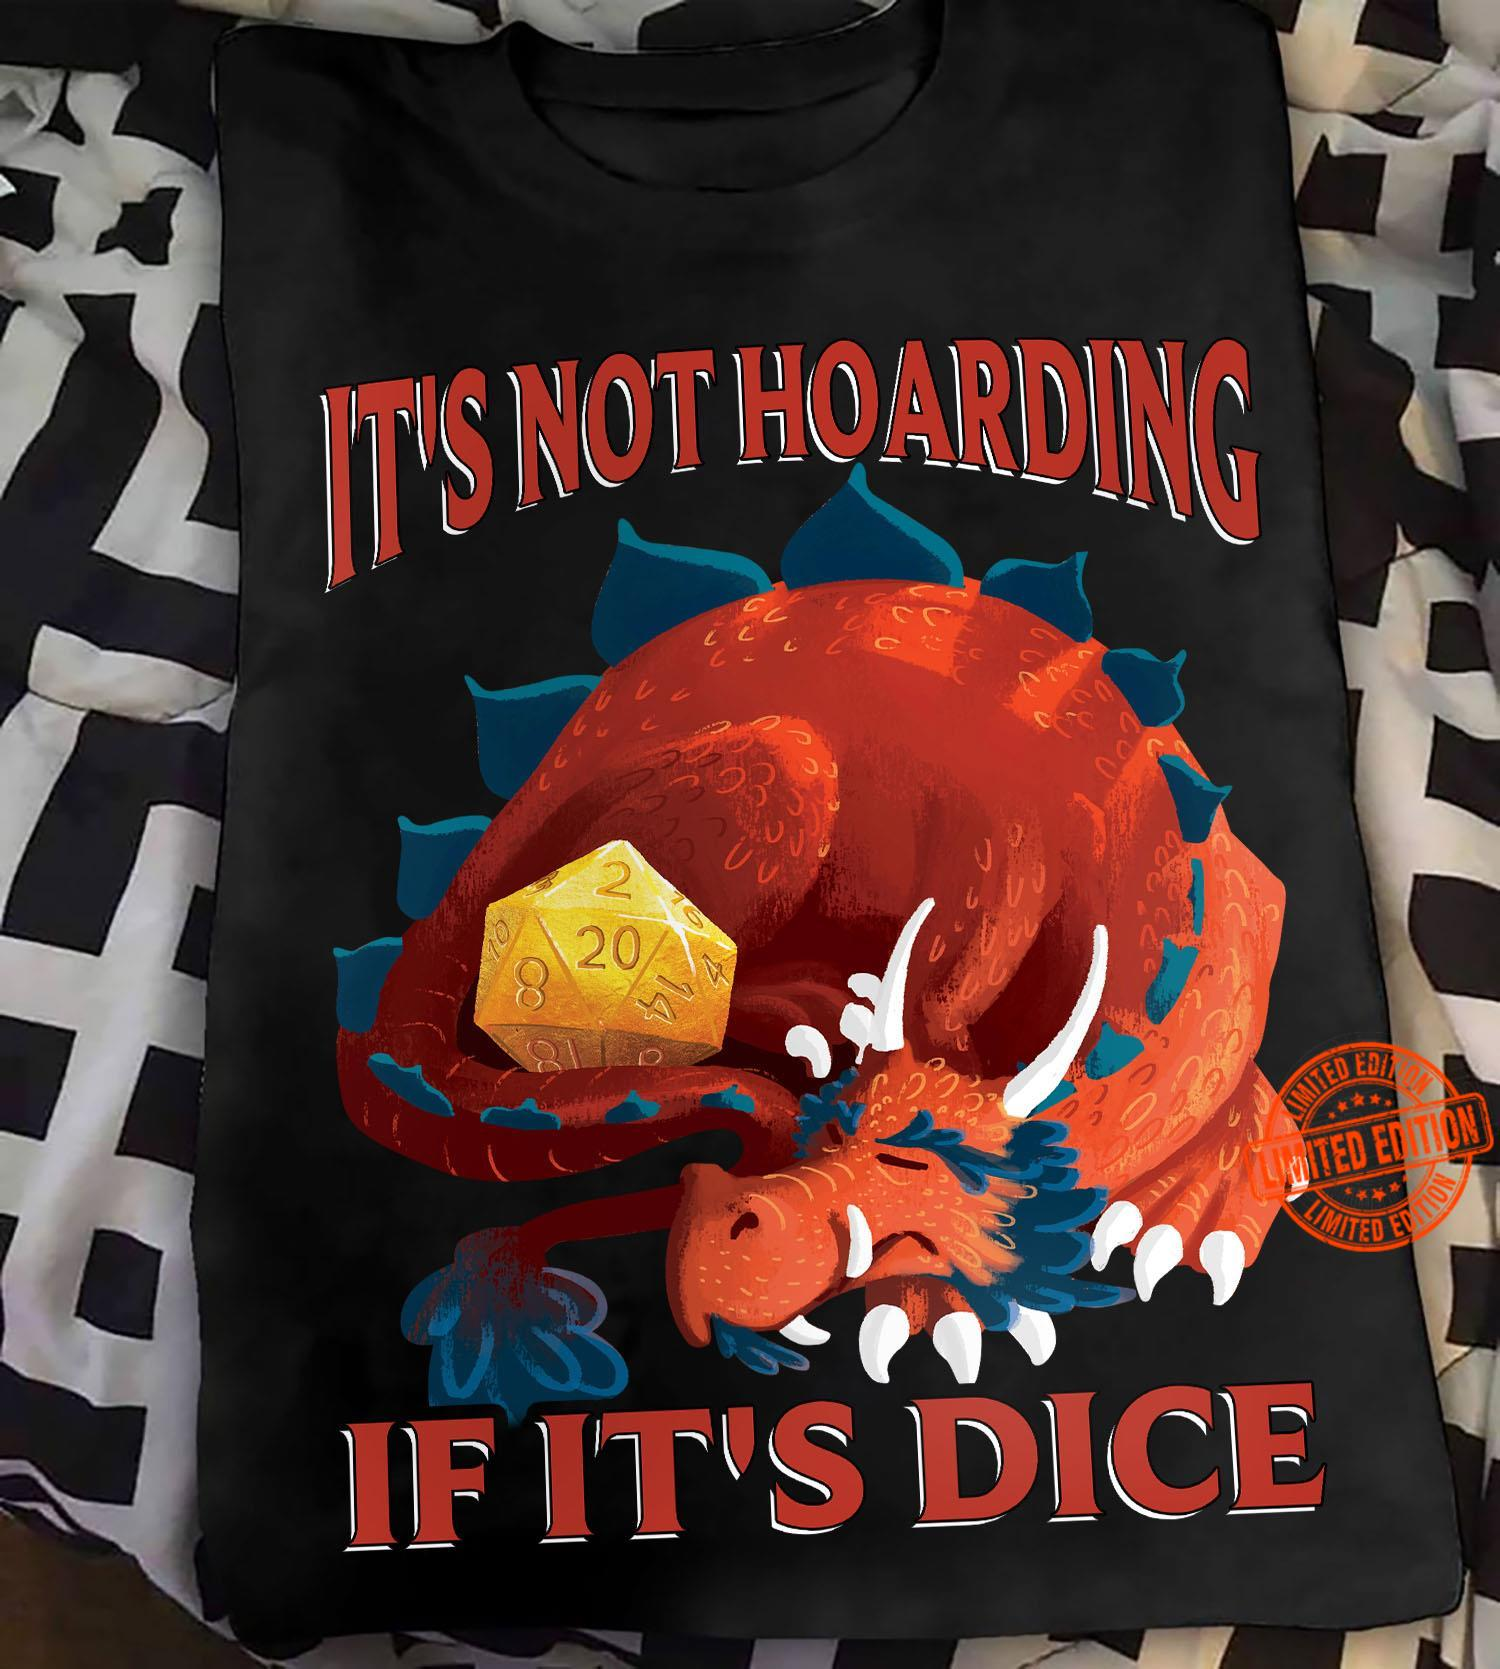 It's Not Hoarding If It's Dice Shirt